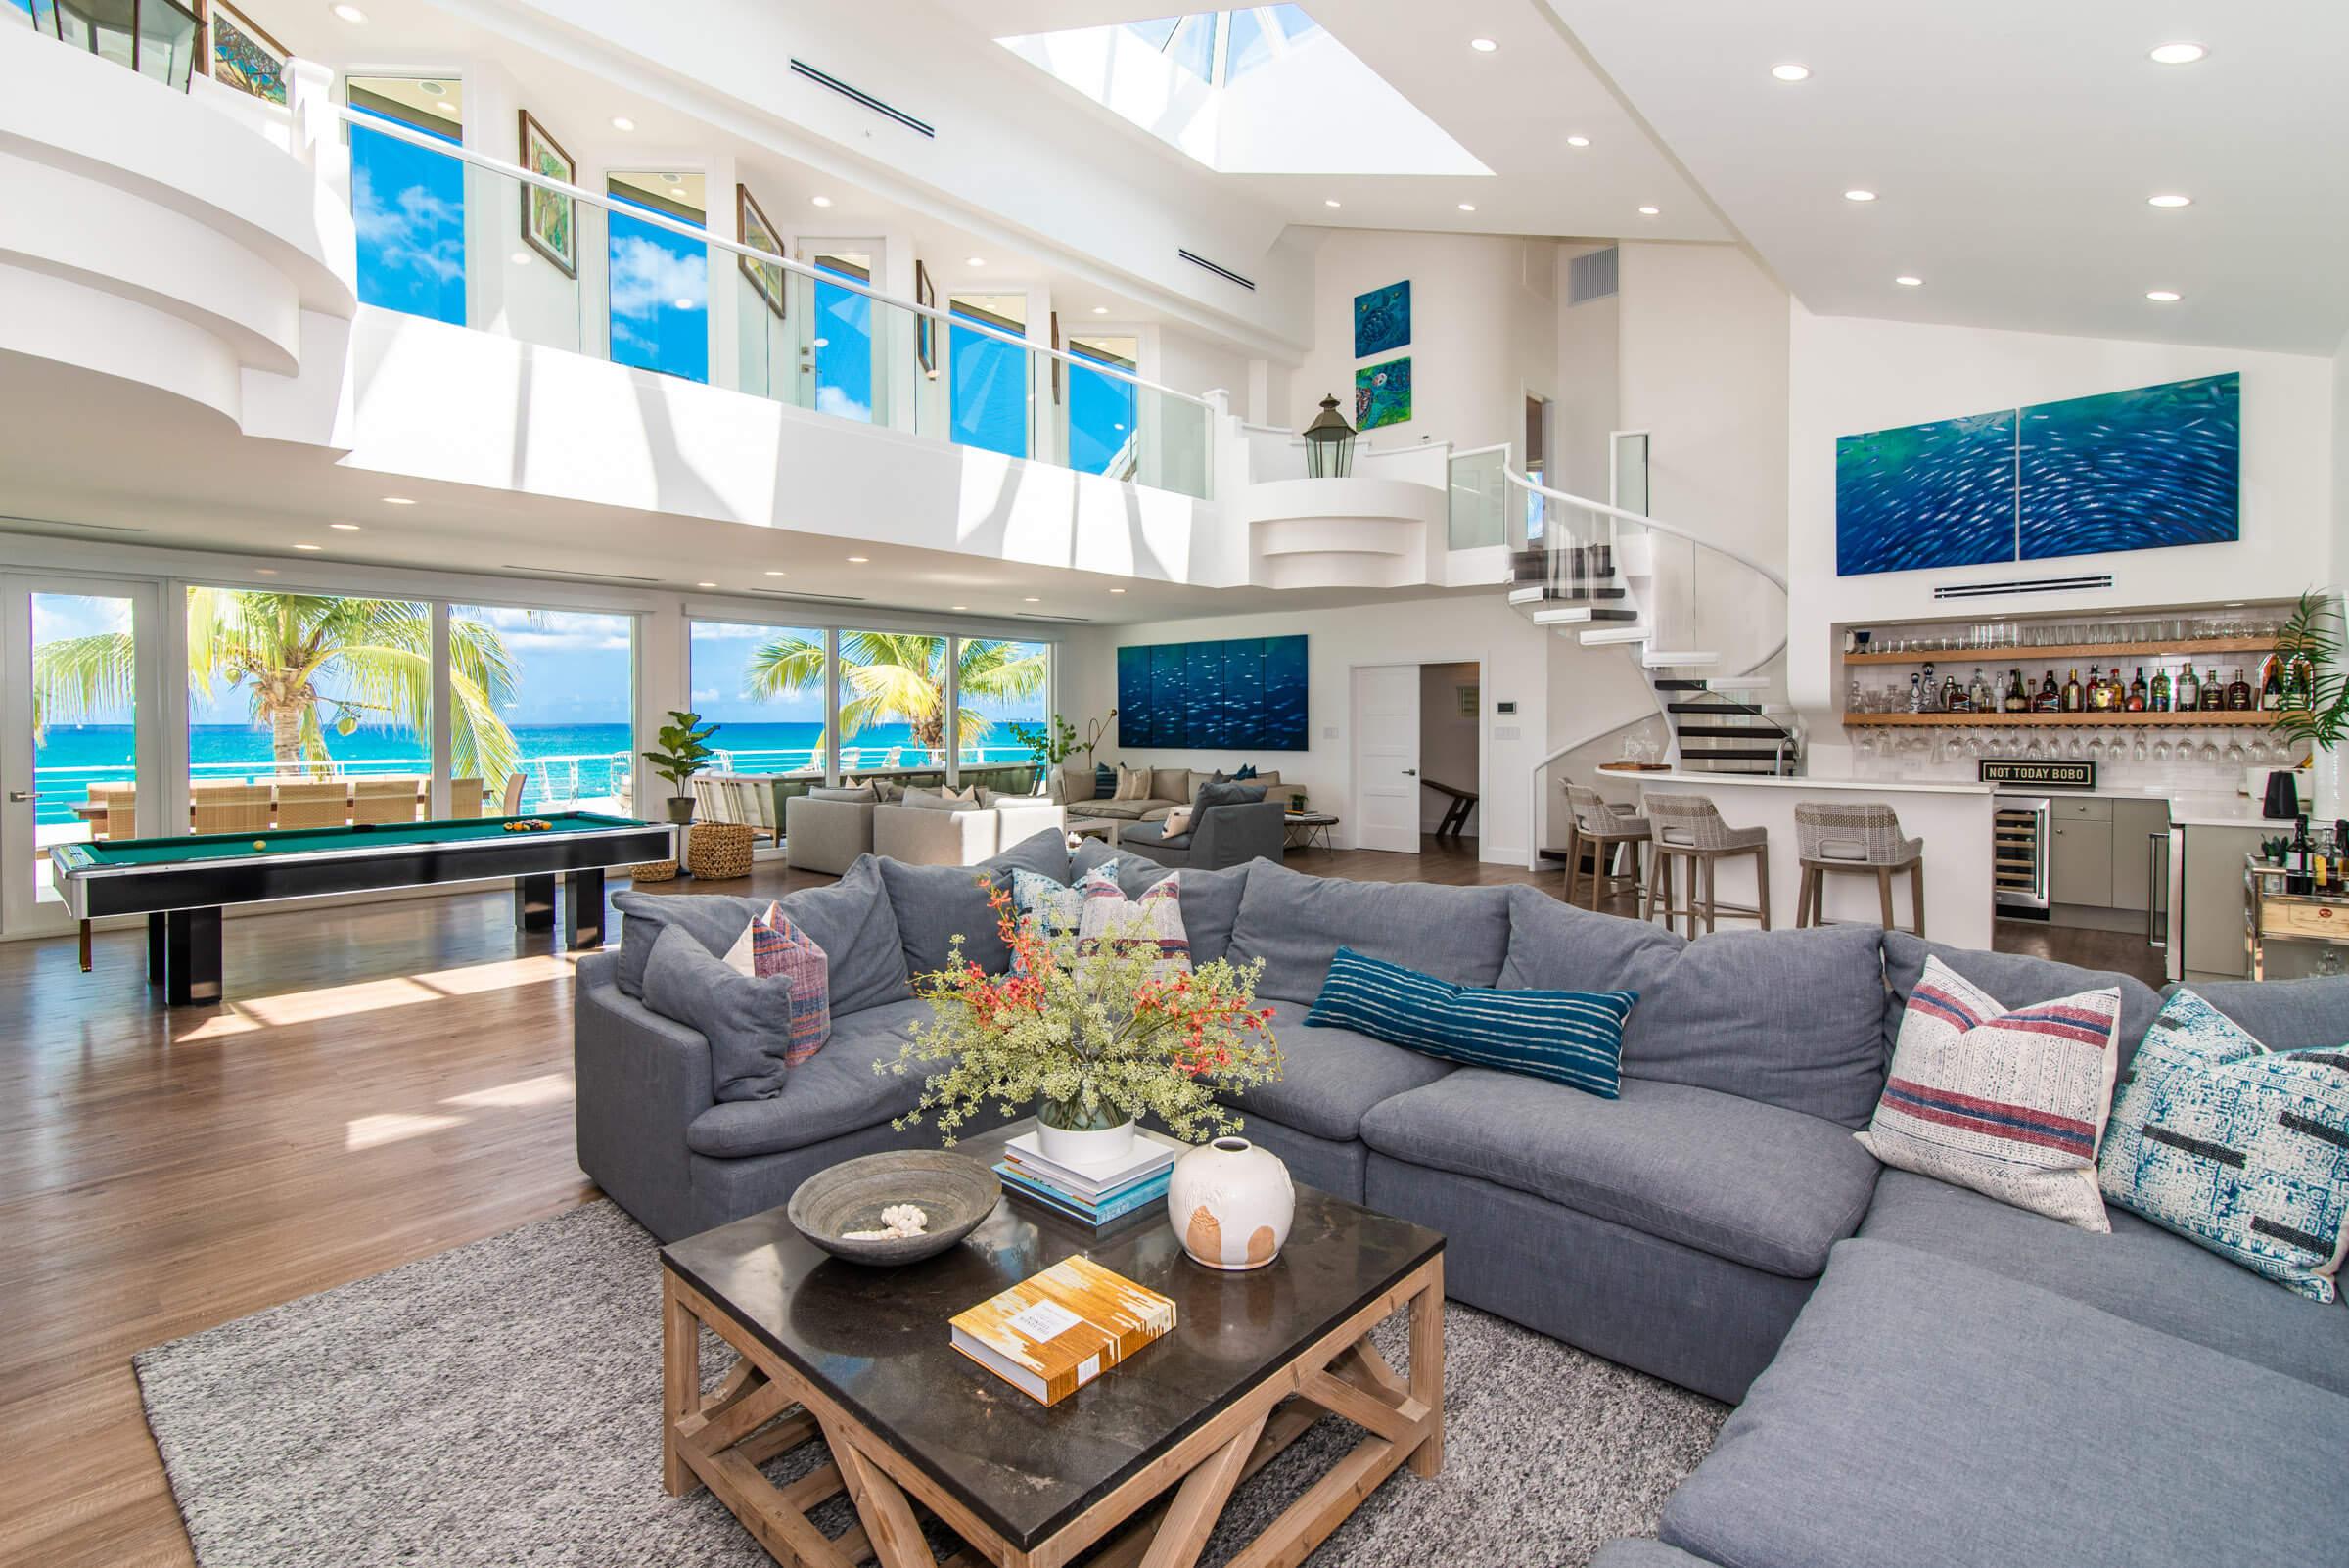 ascape Villa Cayman Islands Grand Cayman Family Beachfront Luxury Caribbean Vacation Rental Dining Room Family Room Entertainment Area